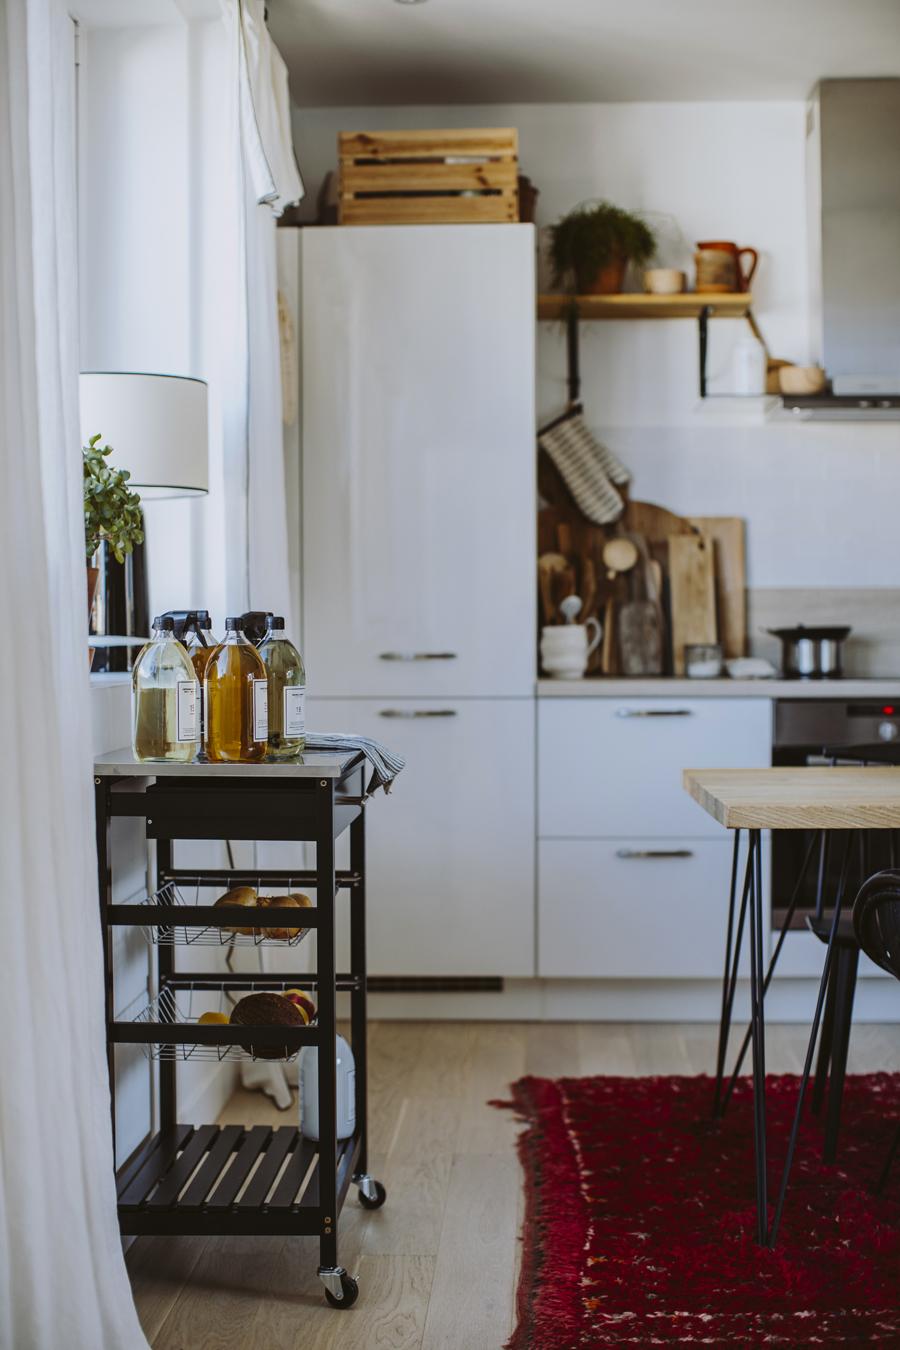 o trouver du vrac liquide les demoizelles. Black Bedroom Furniture Sets. Home Design Ideas